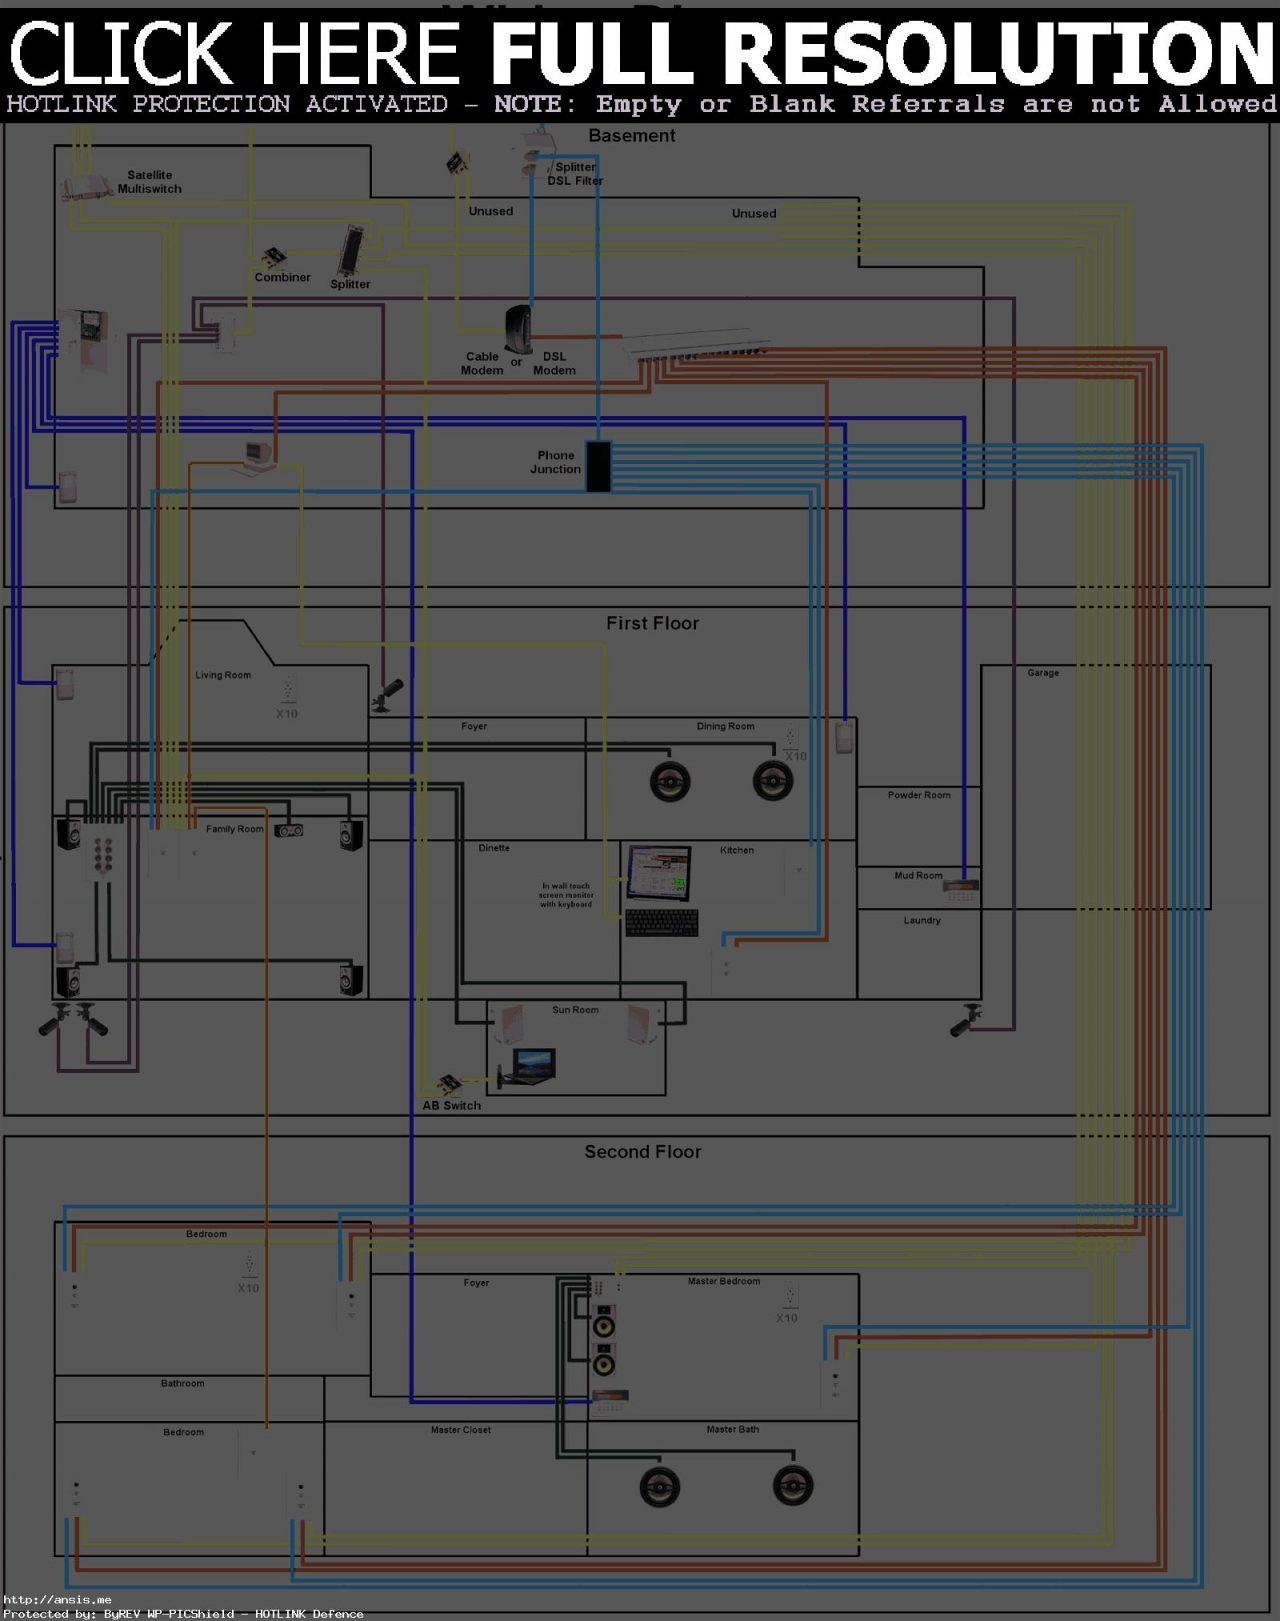 Dsl Pots Splitter Wiring Diagram Best Of Dsl Pots Splitter Wiring - Dsl Phone Jack Wiring Diagram